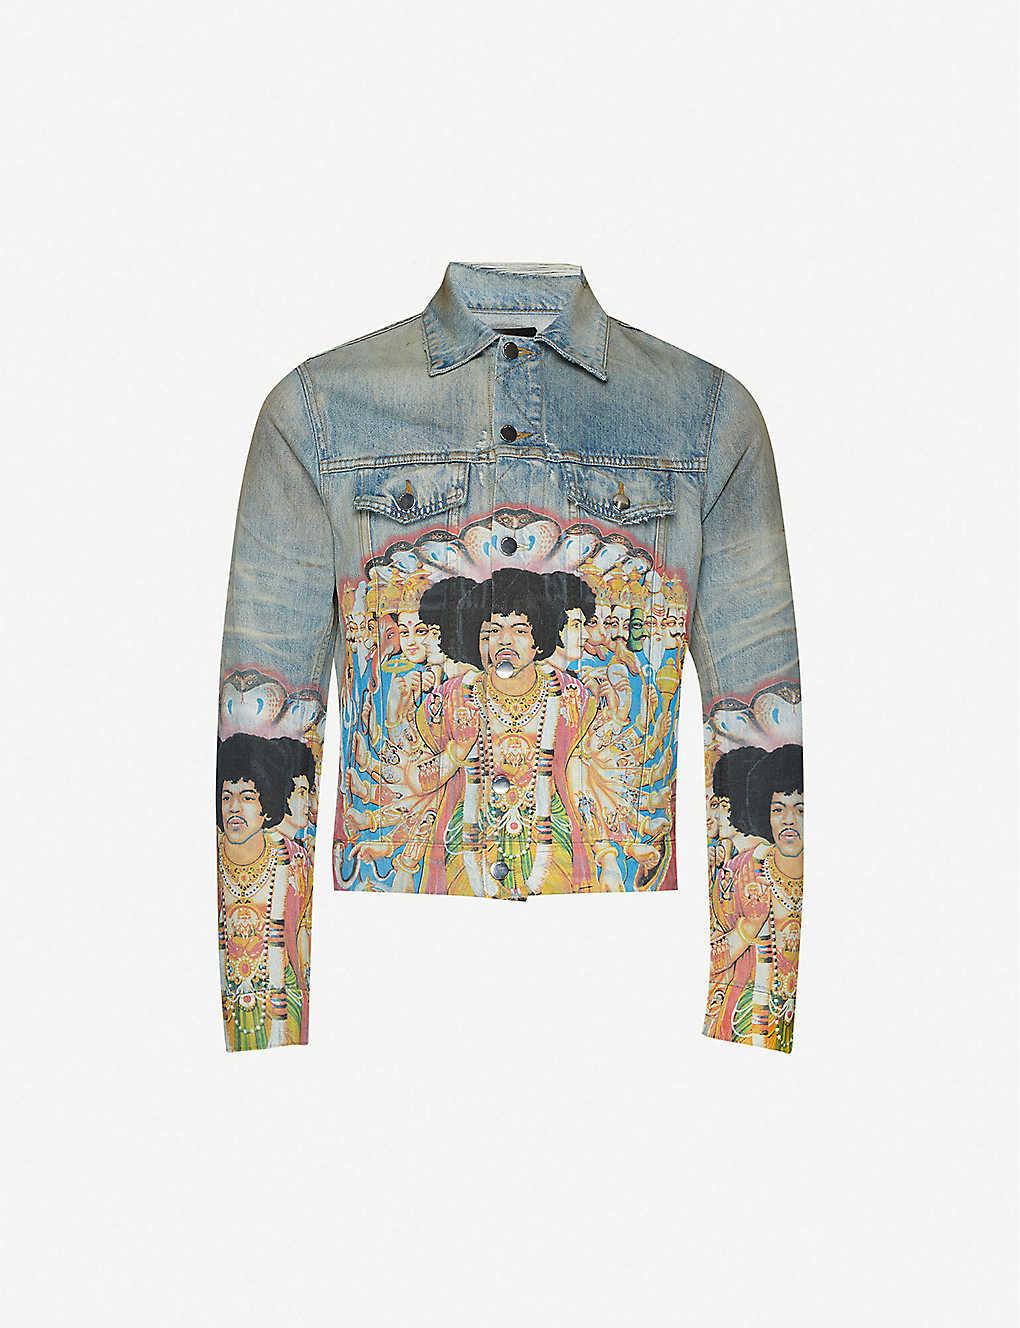 PAUSE or Skip: AMIRI Jimi Hendrix Denim Jacket